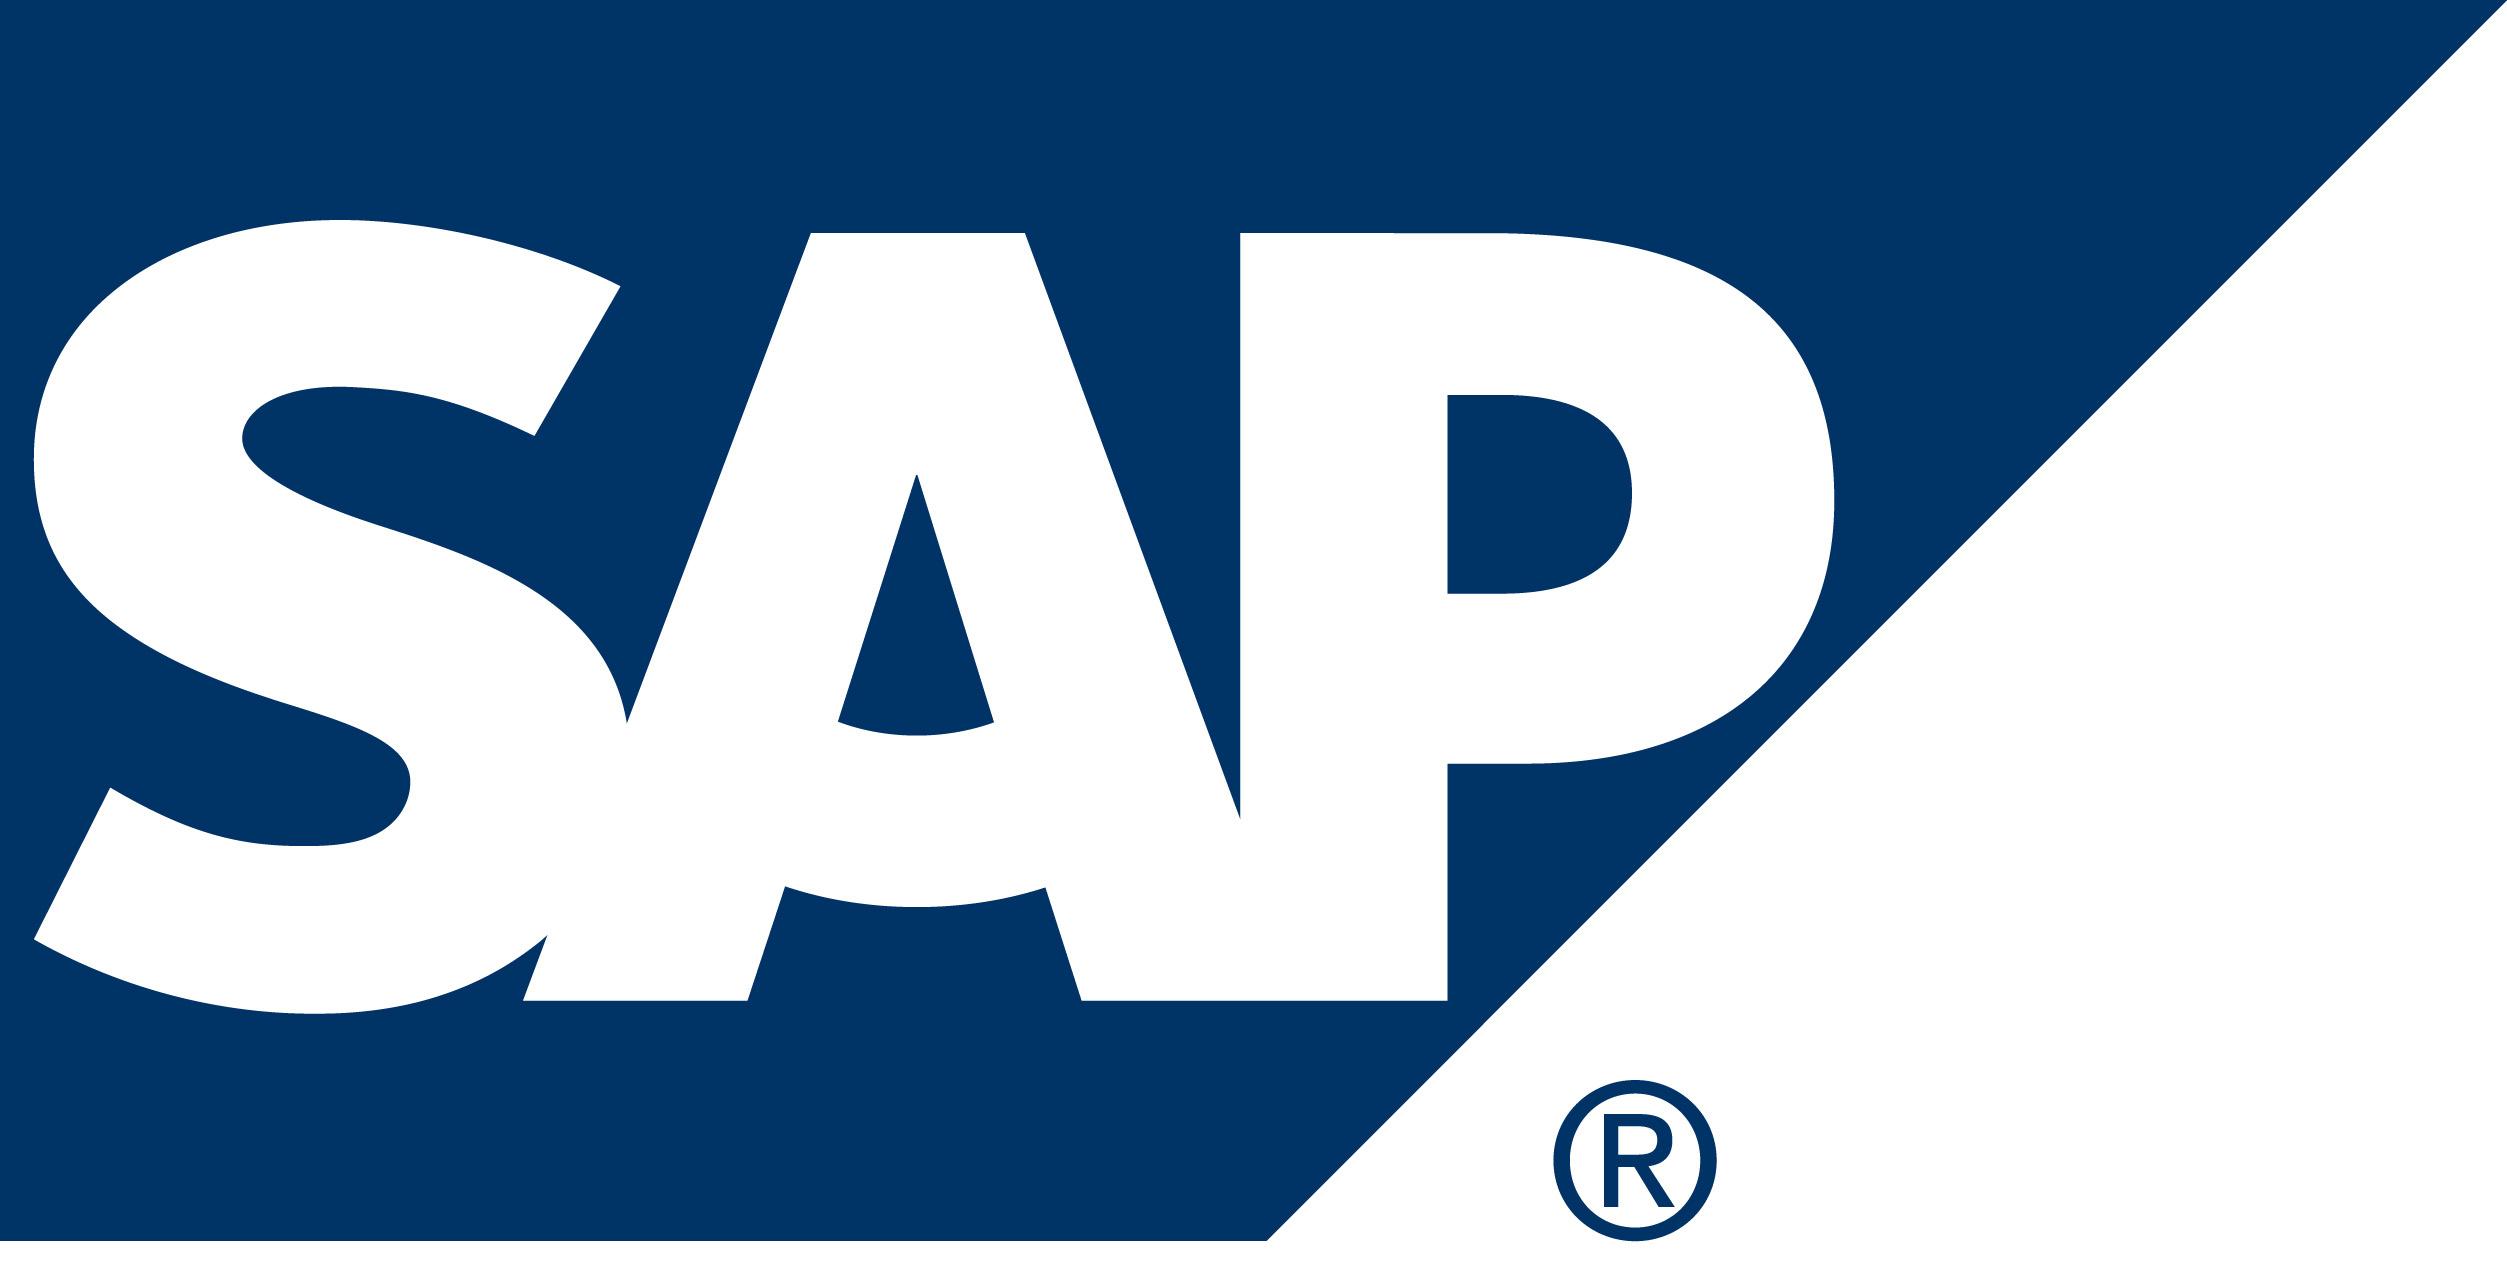 SAP за III квартал 2014 года увеличила прибыль на 15%